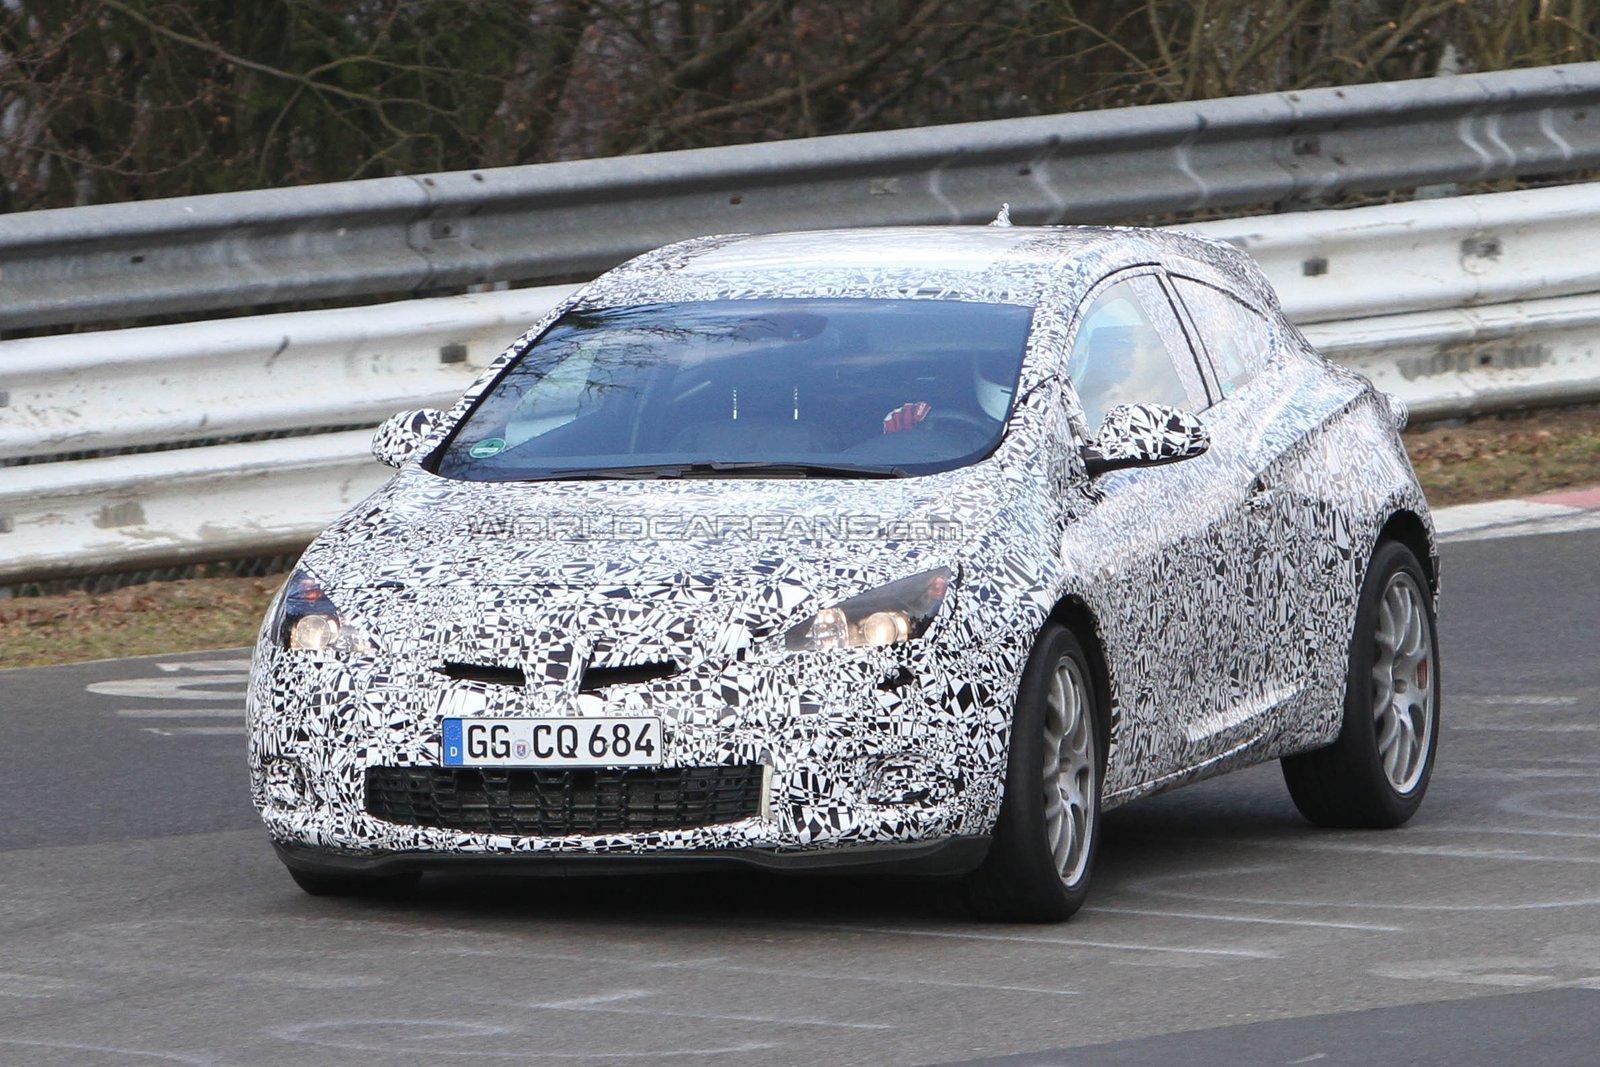 2012 Opel Astra OPC Spyshot